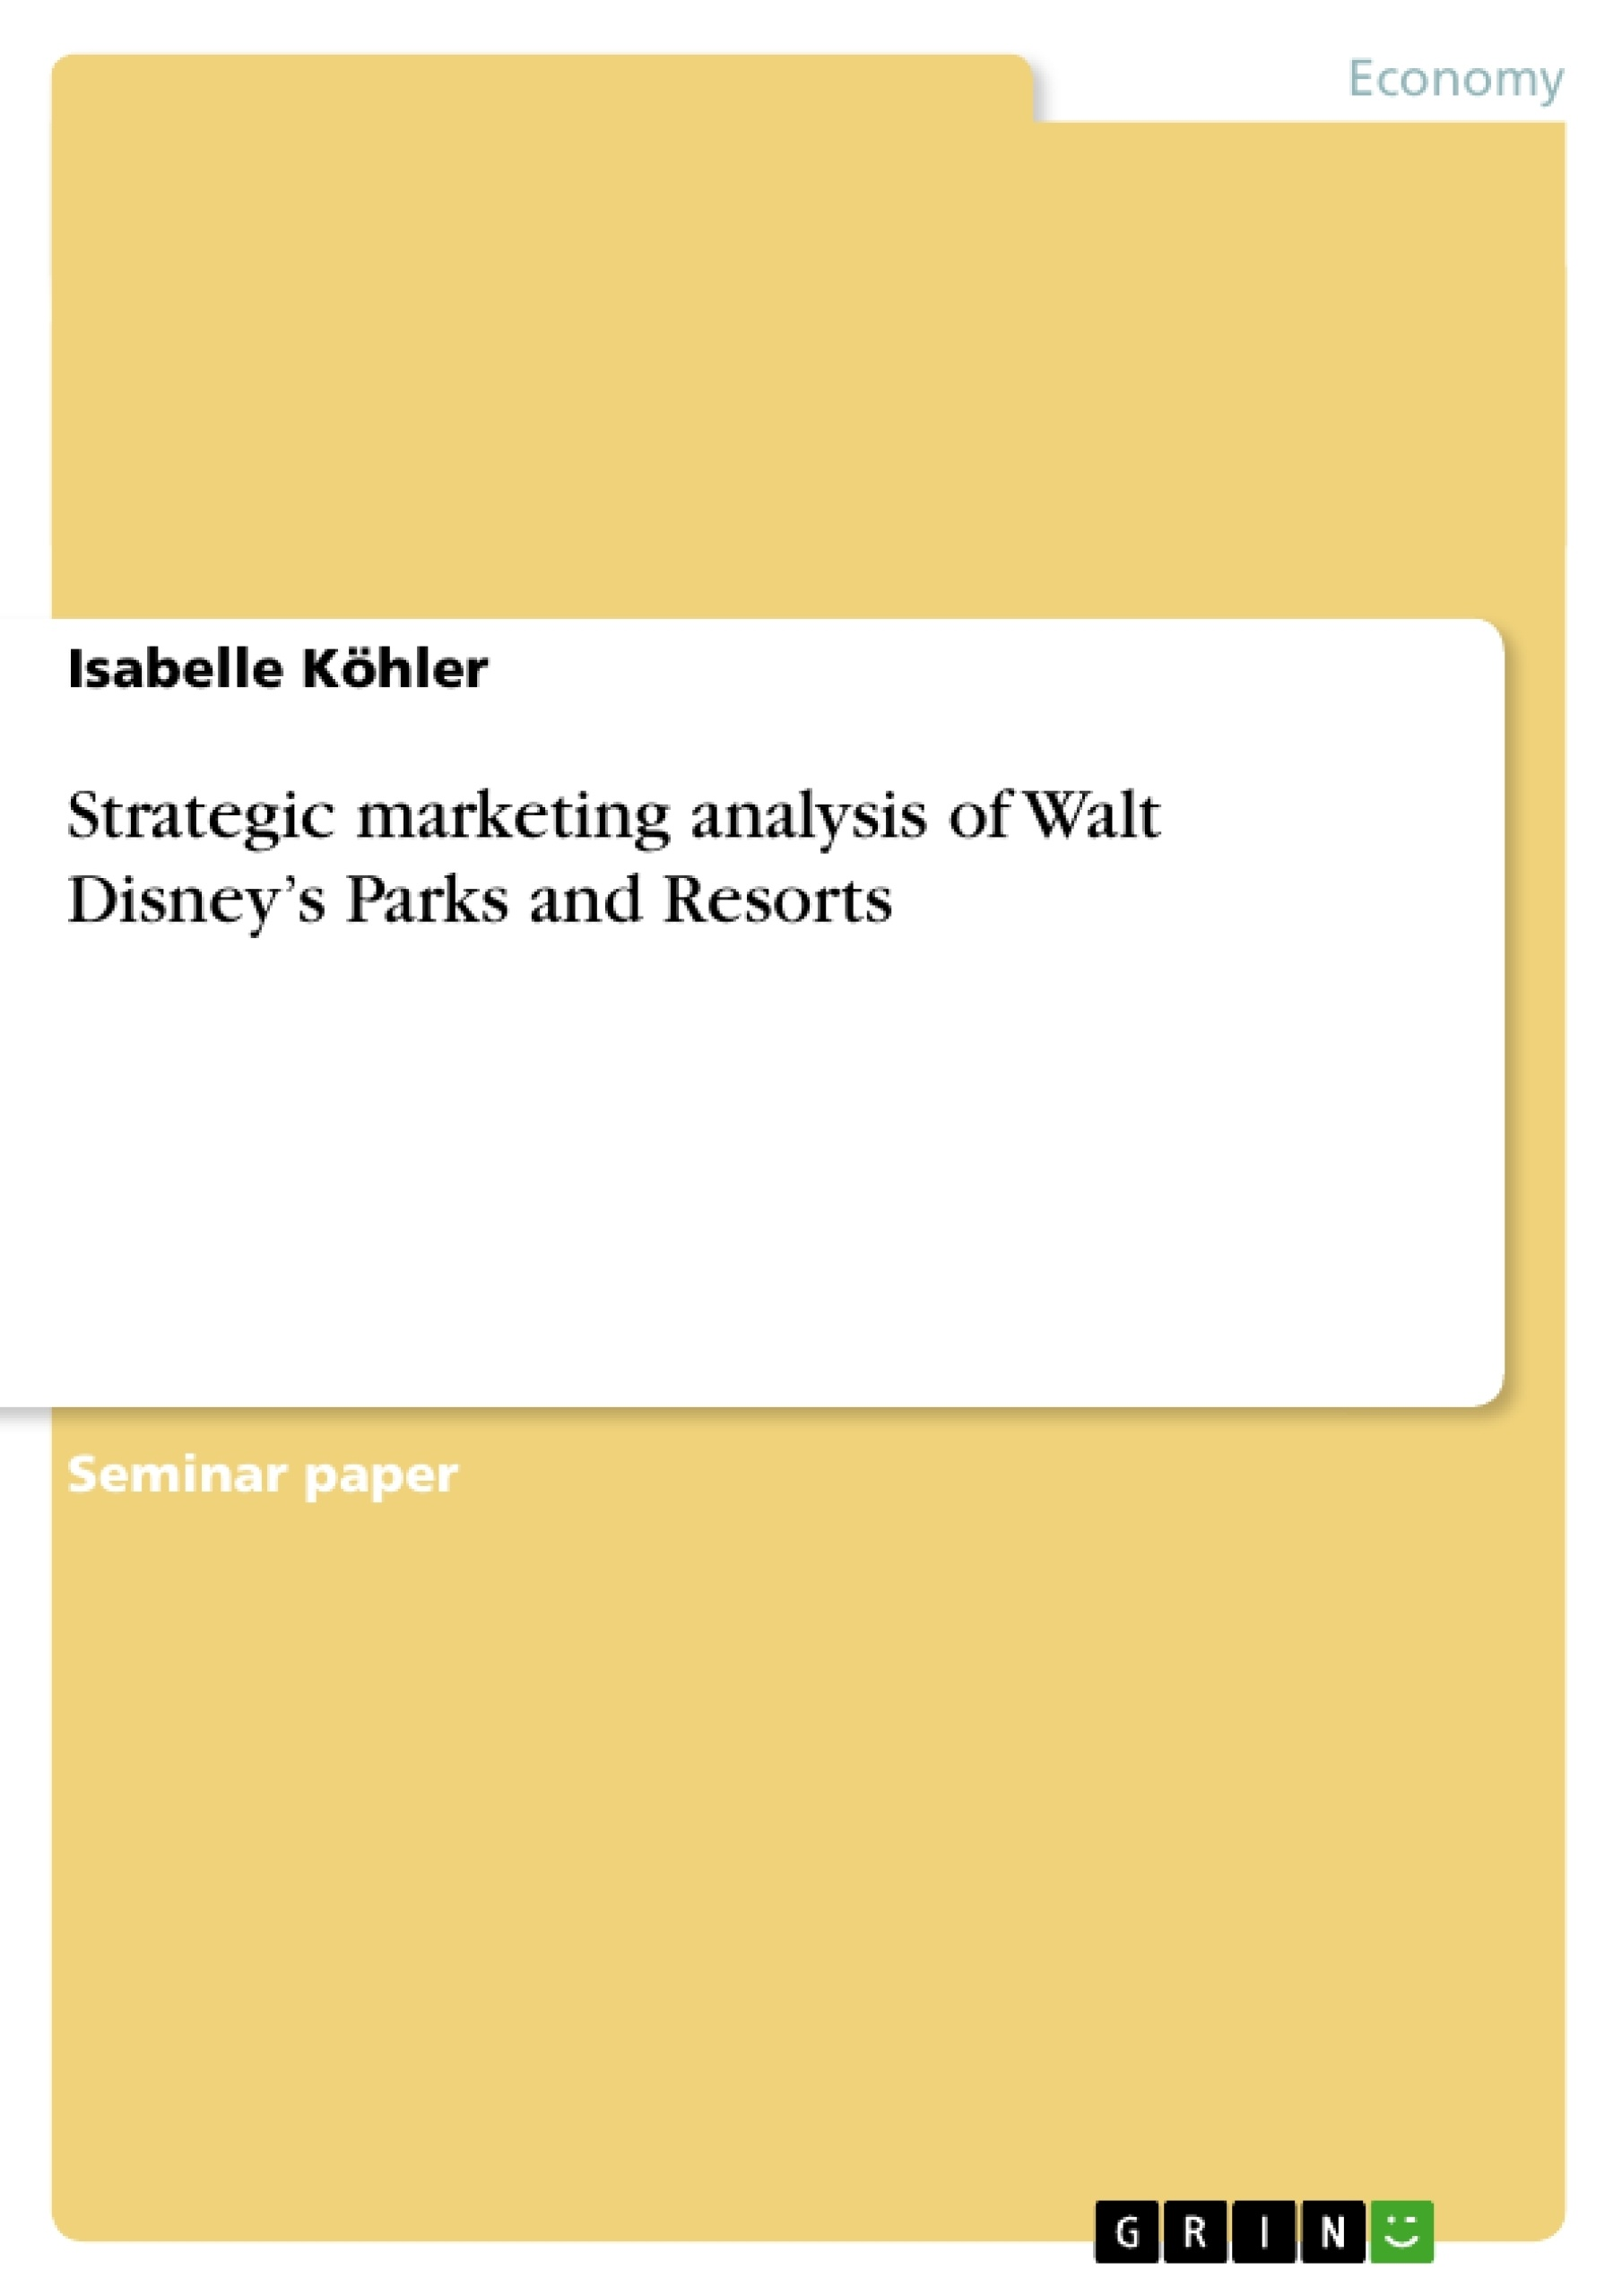 Disney macro environment analysis